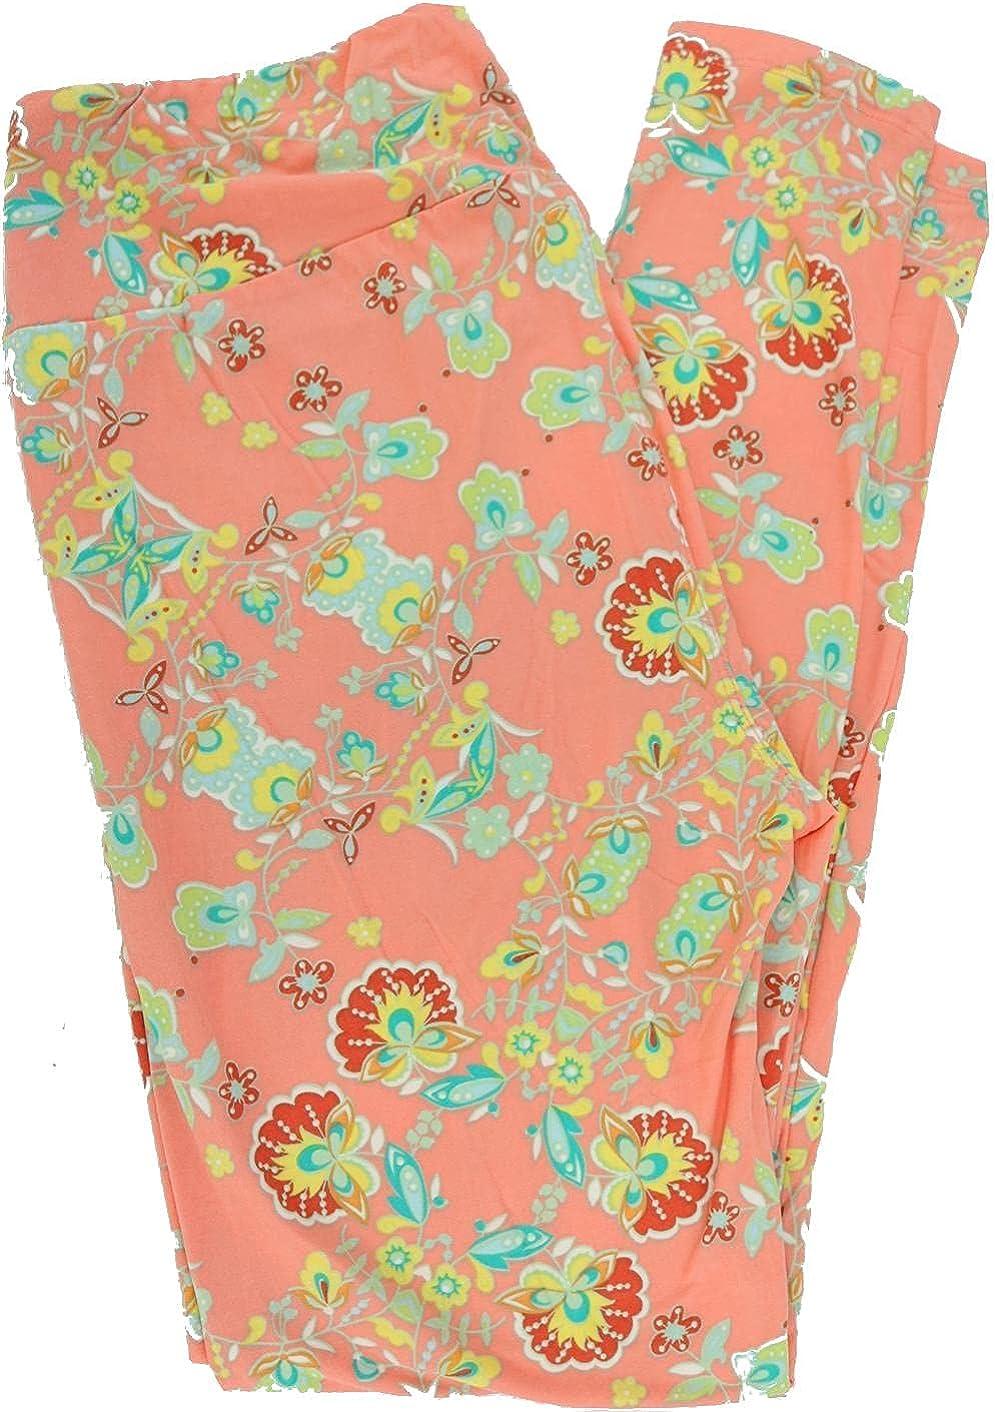 Lularoe Floral Leggings (Tall & Curvy) Fits Pants Size 12-18